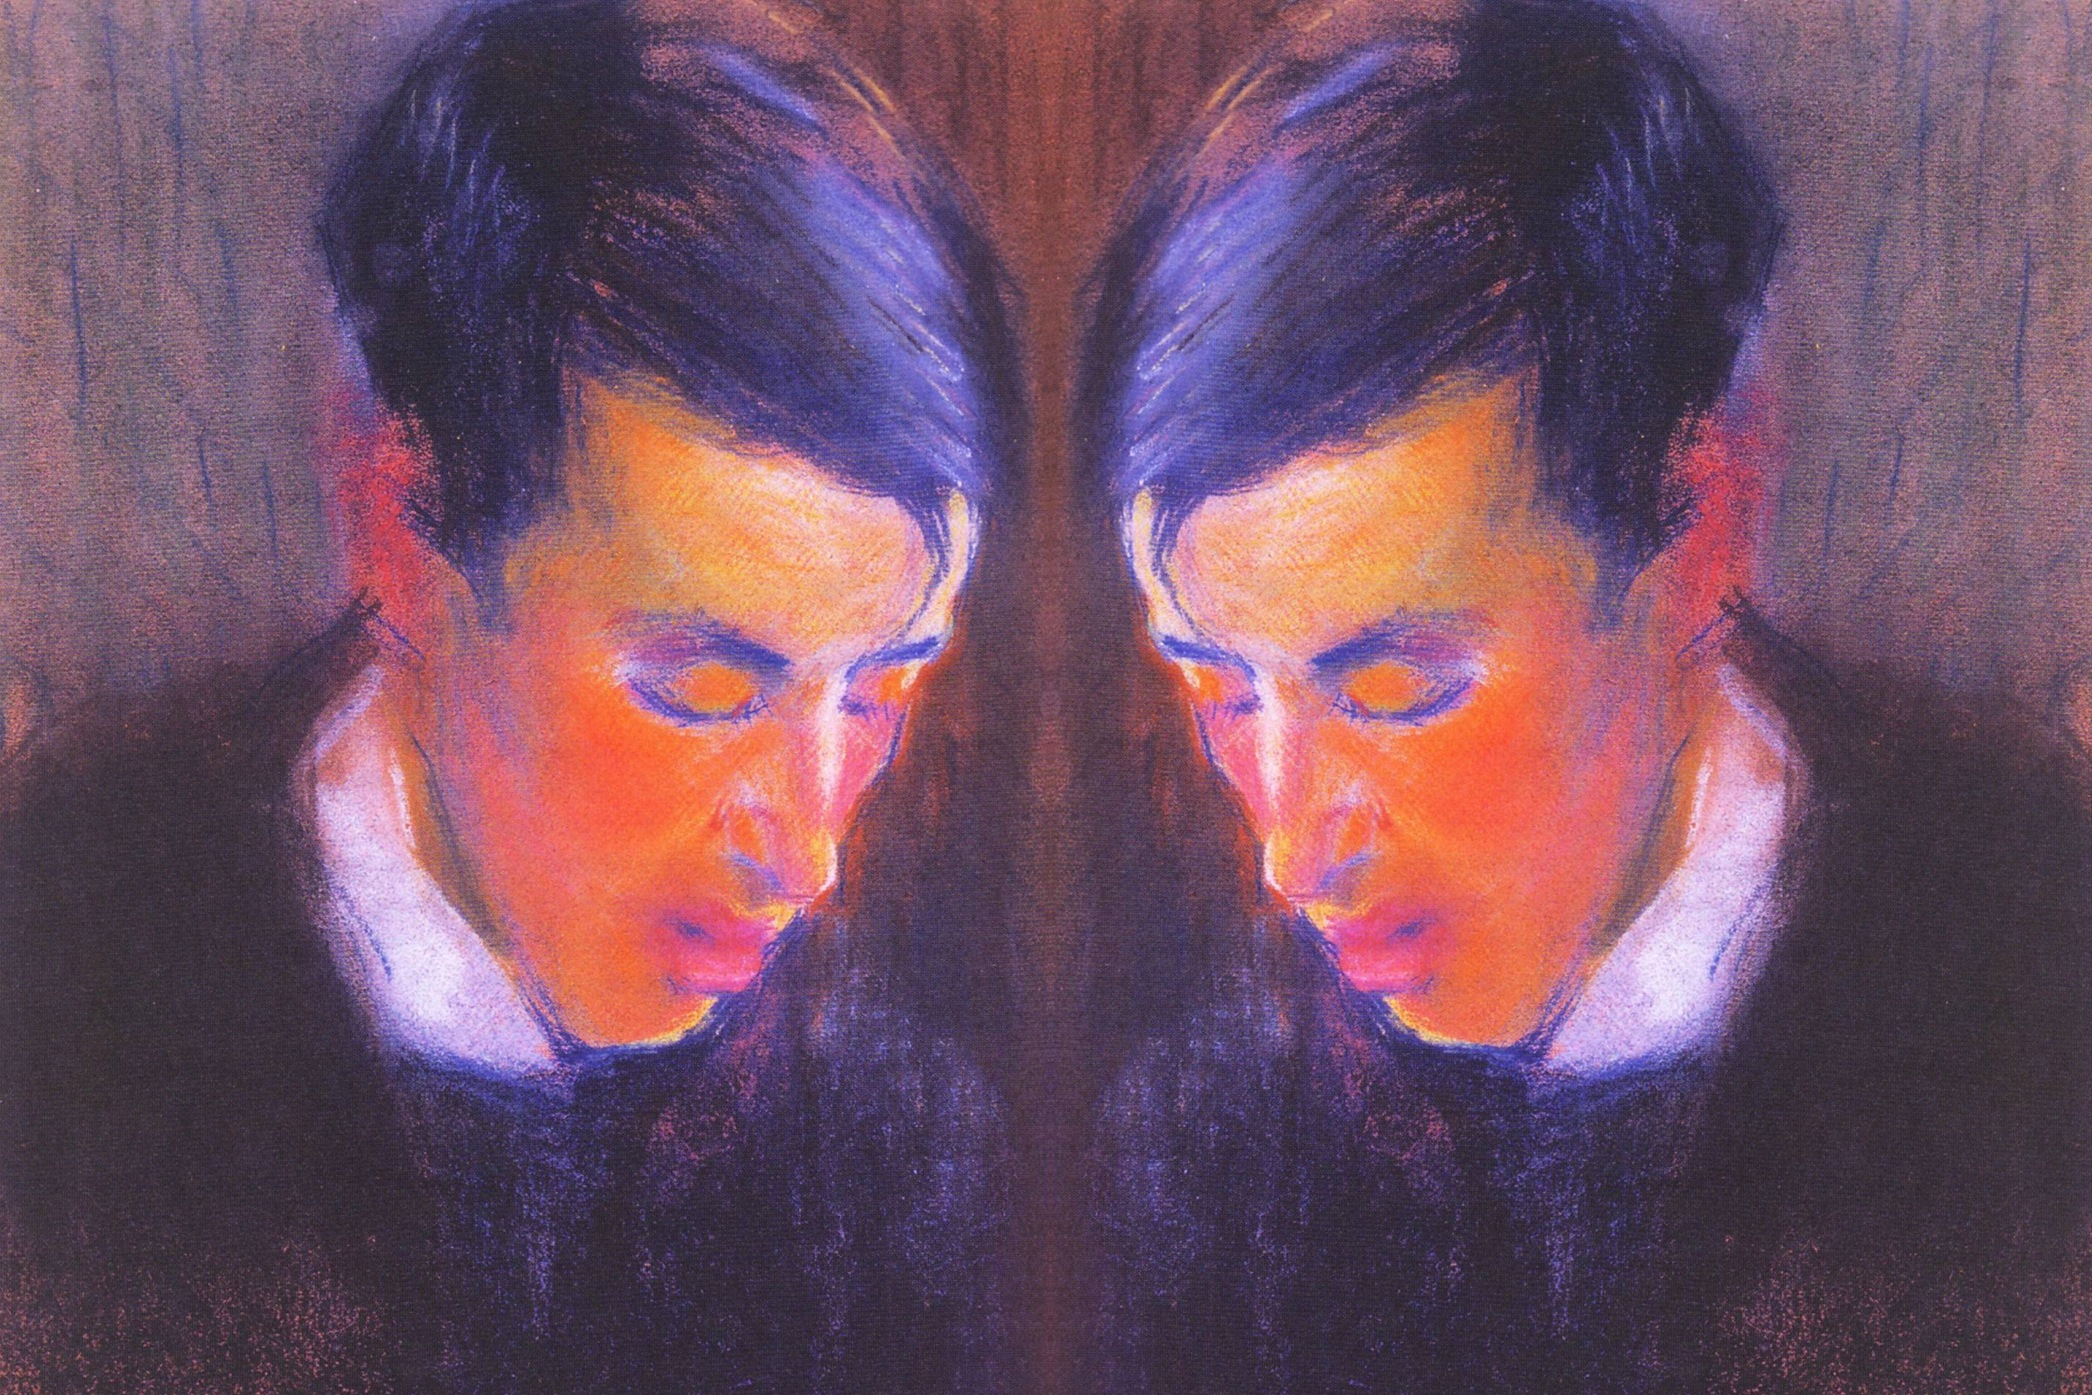 Josef Čapek: Hlava Karla Čapka (1907)